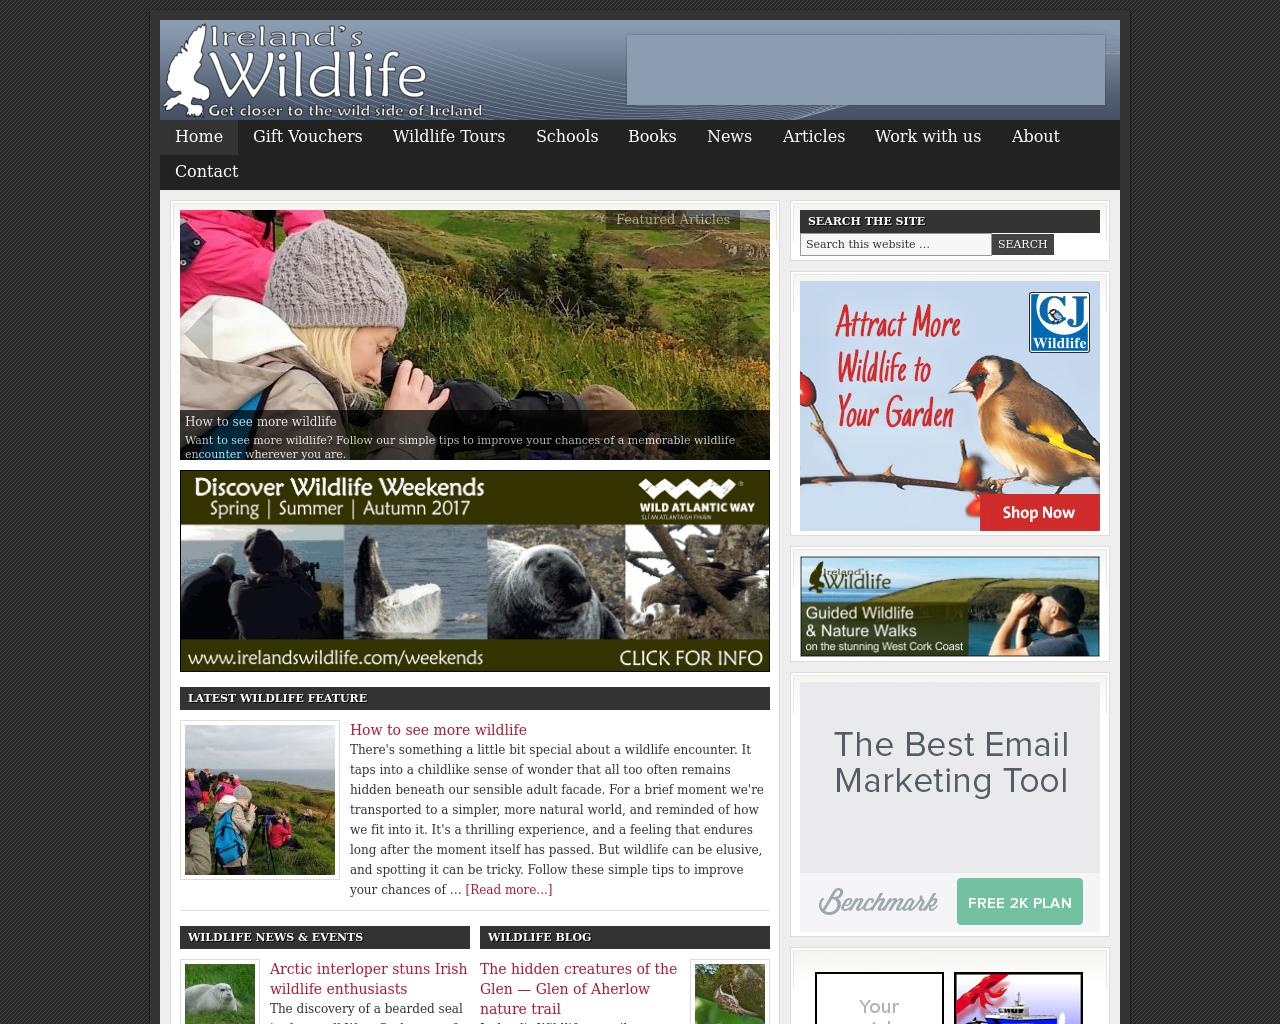 Ireland's-Wildlife-Advertising-Reviews-Pricing